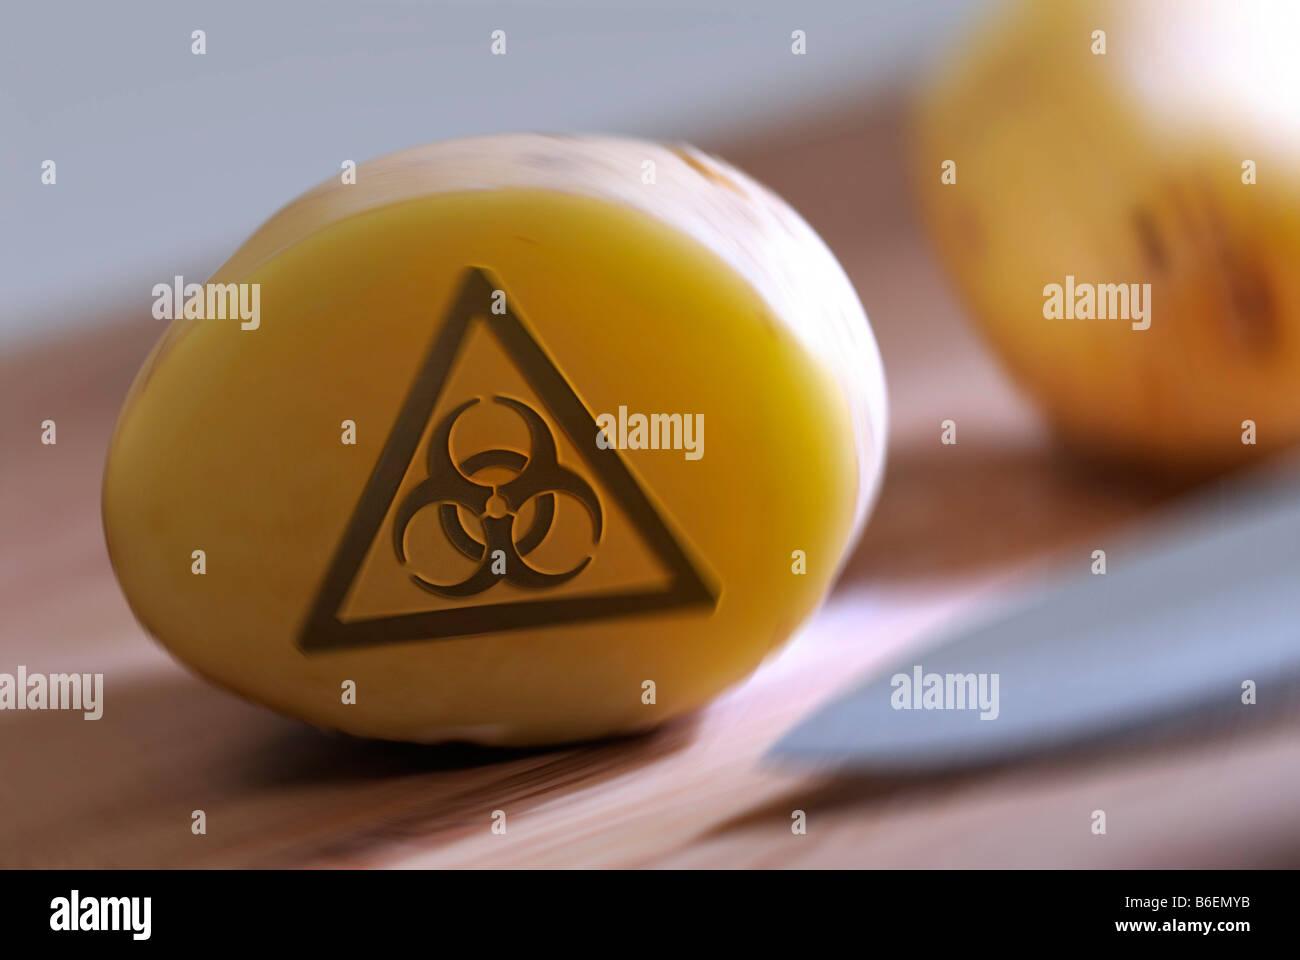 Sliced potato with a Bio-hazard symbol, symbolic photo for genetically modified potatoes - Stock Image